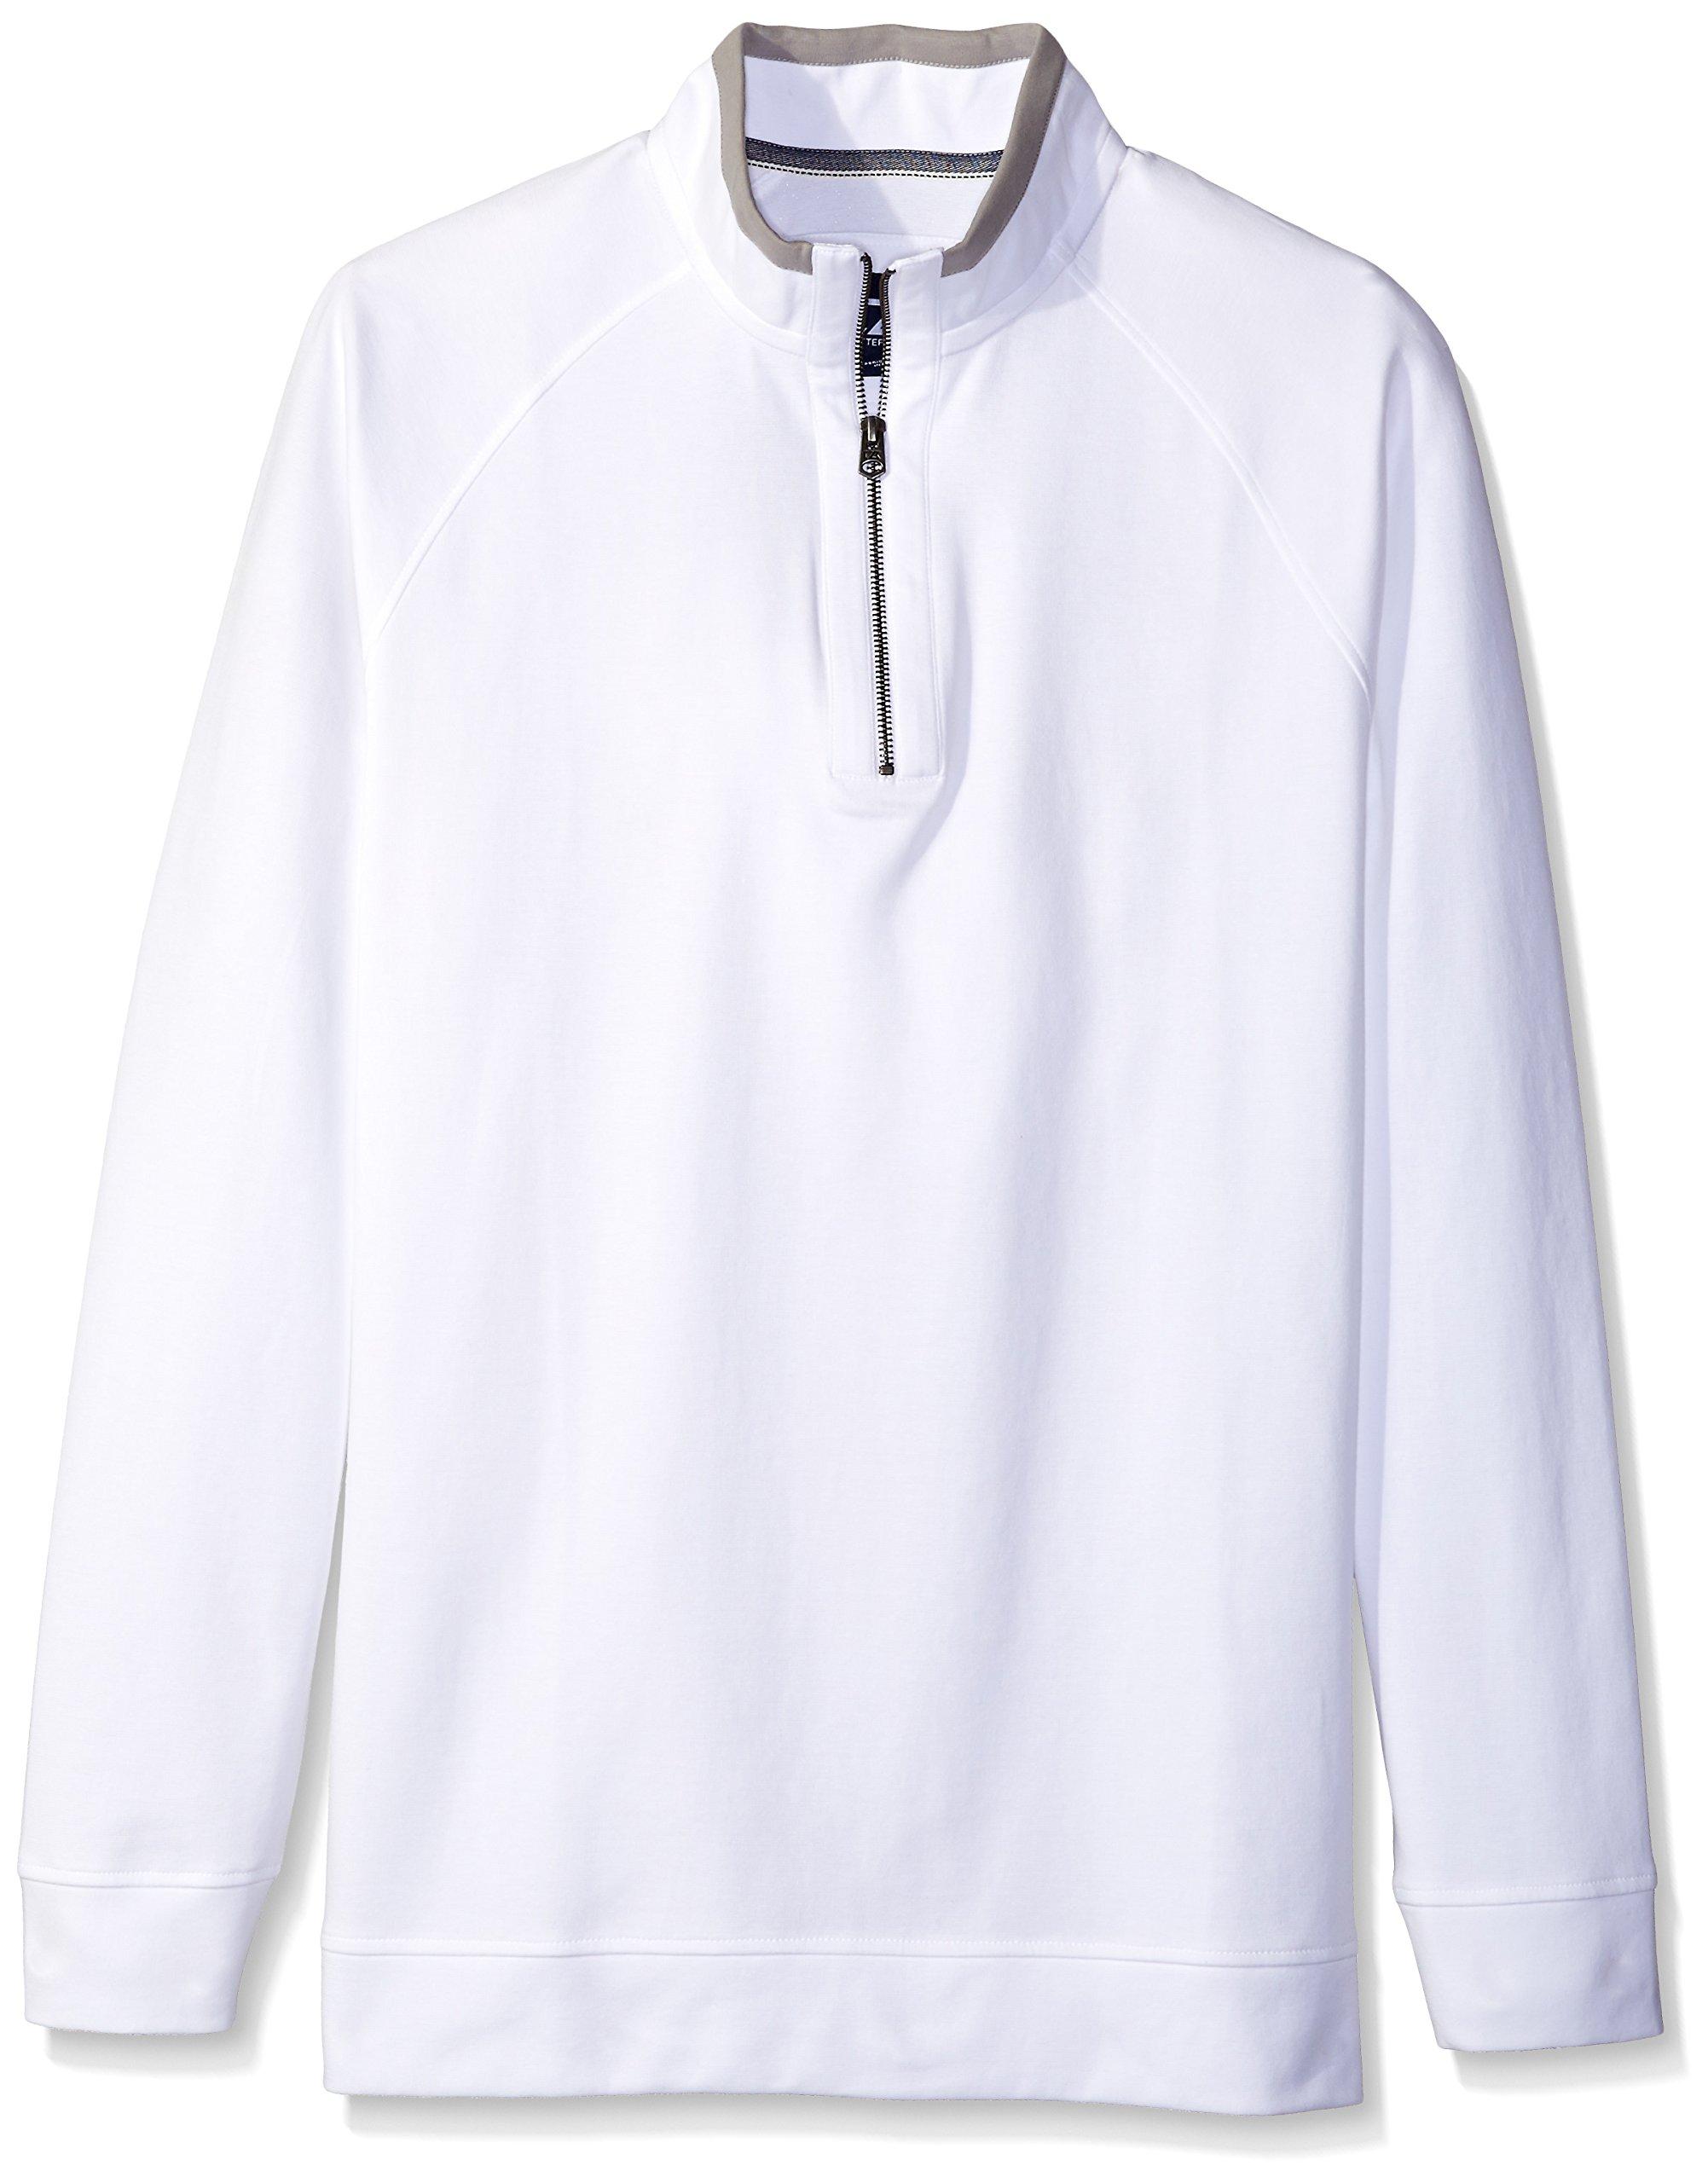 Cutter & Buck Men's Big and Tall Emery Half-Zip Sweatshirt, White, 2X/Big